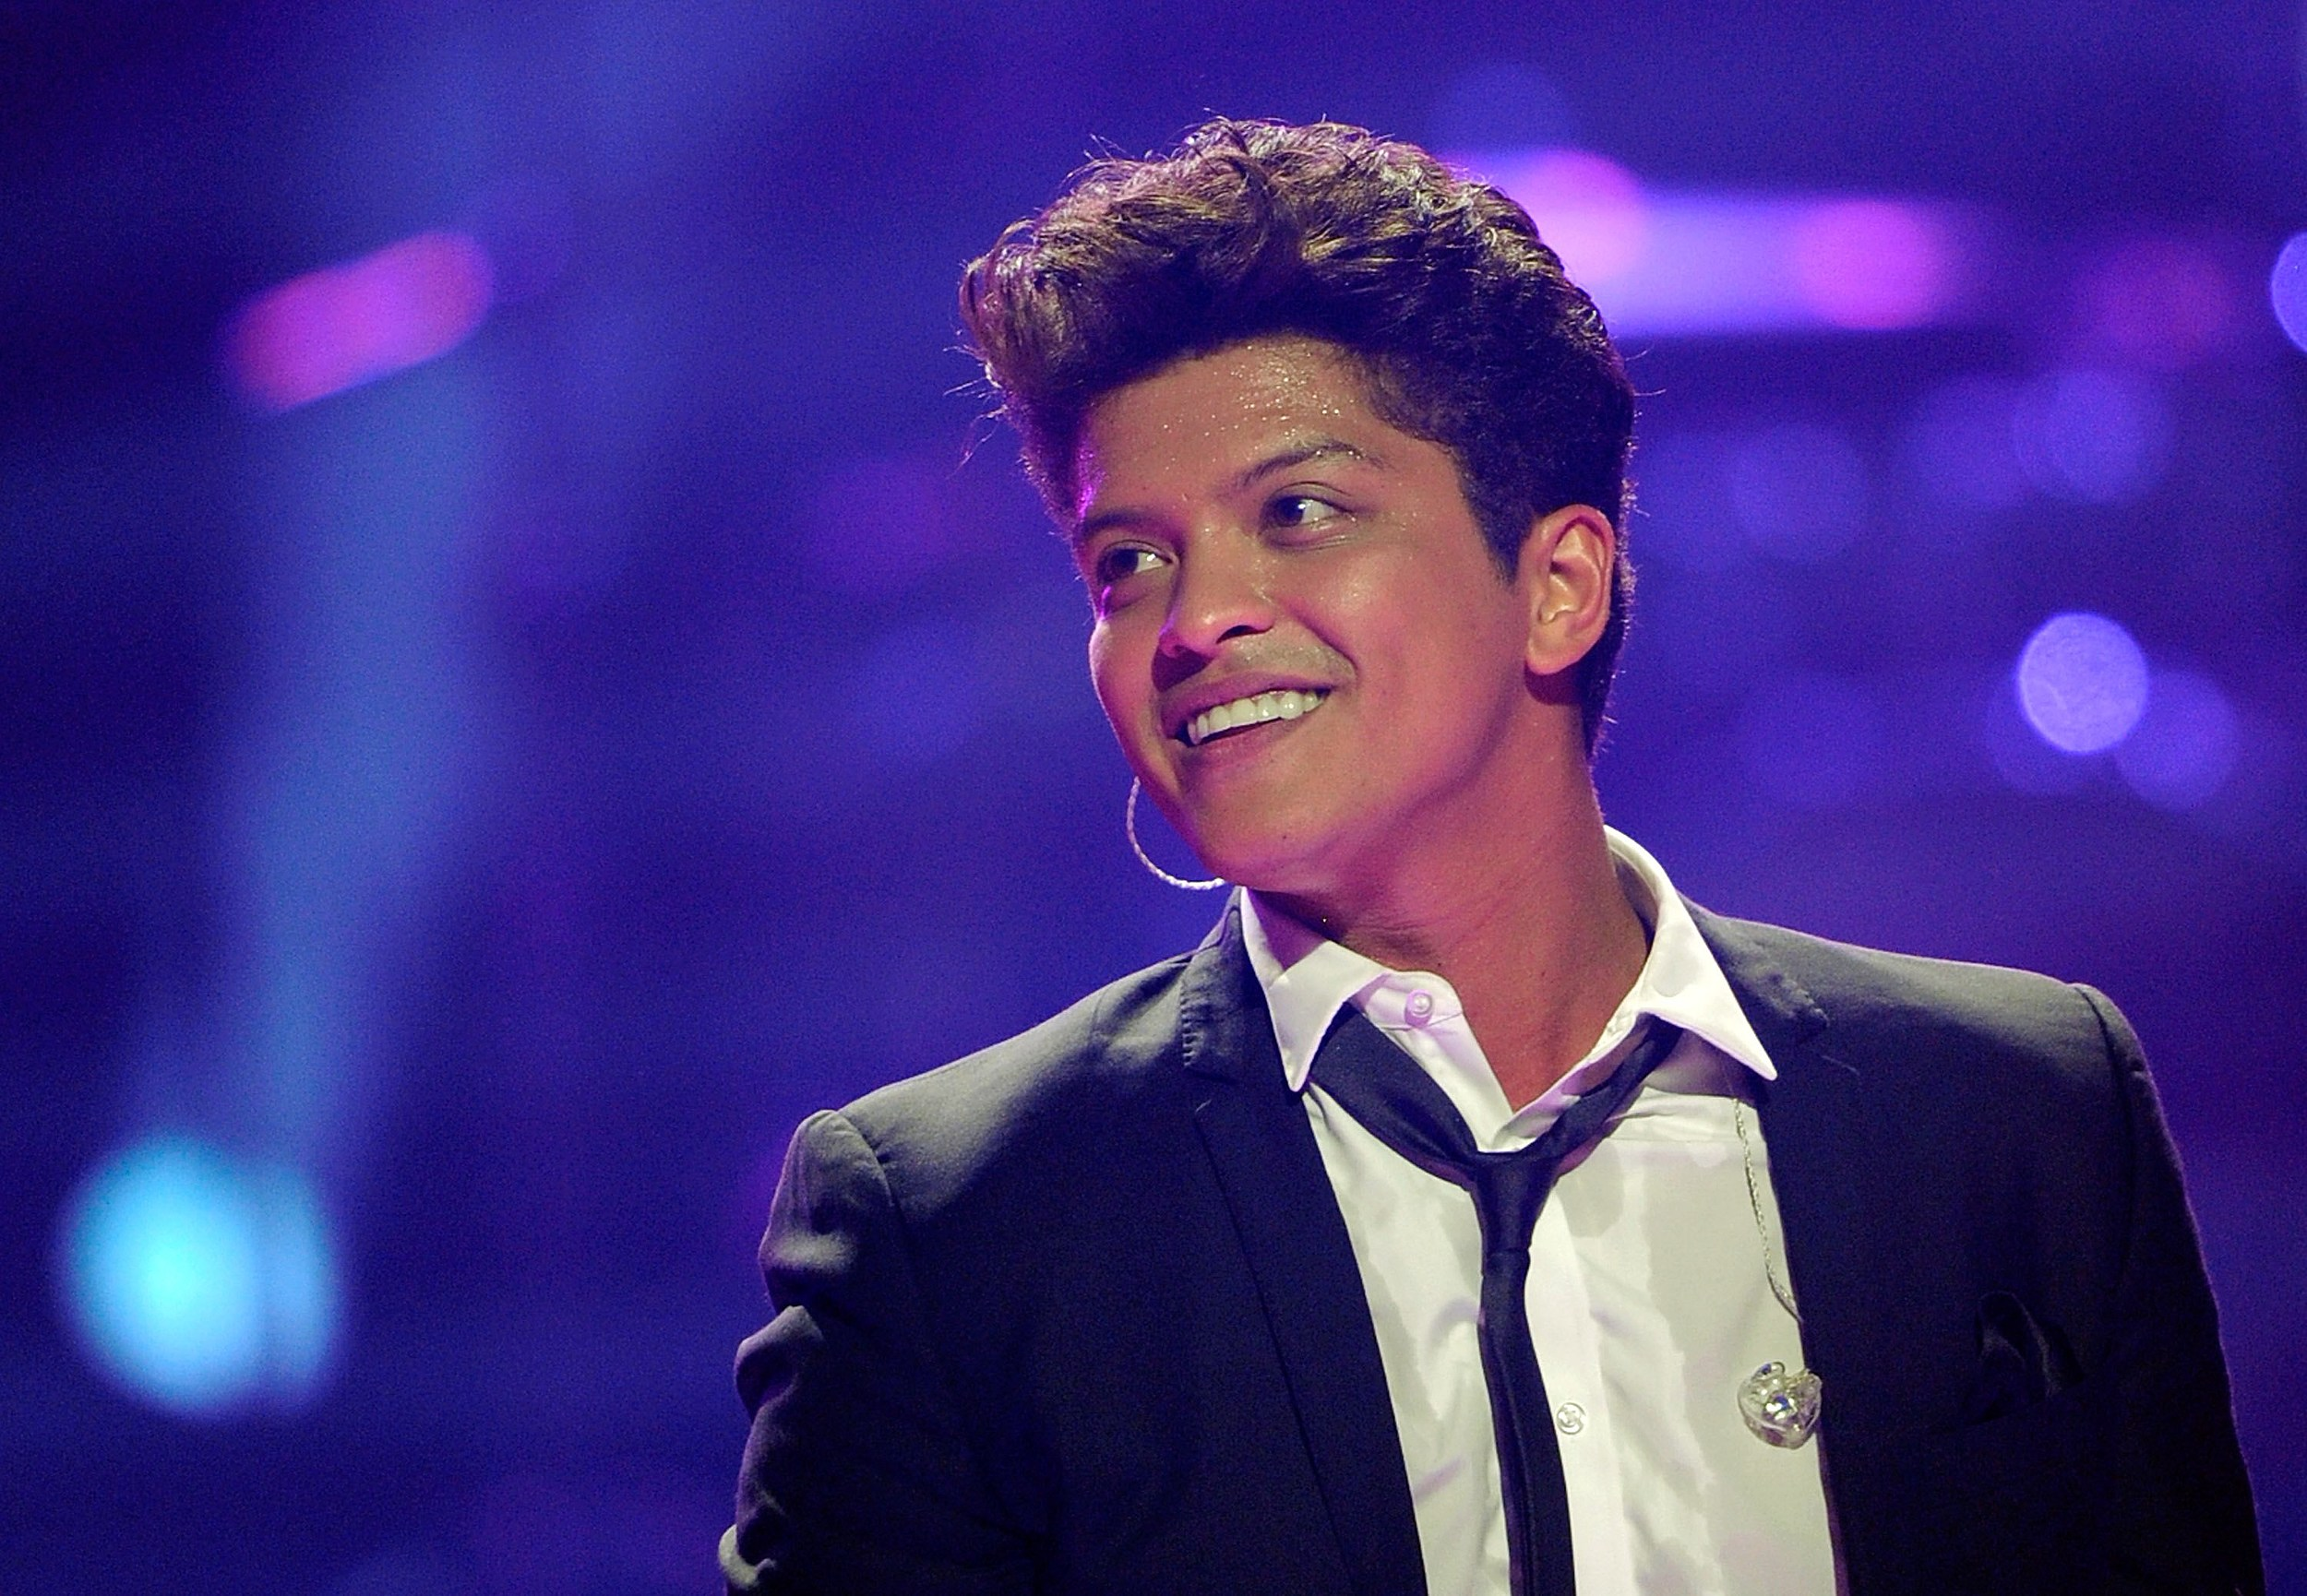 Iheartradio Contest Bruno Mars